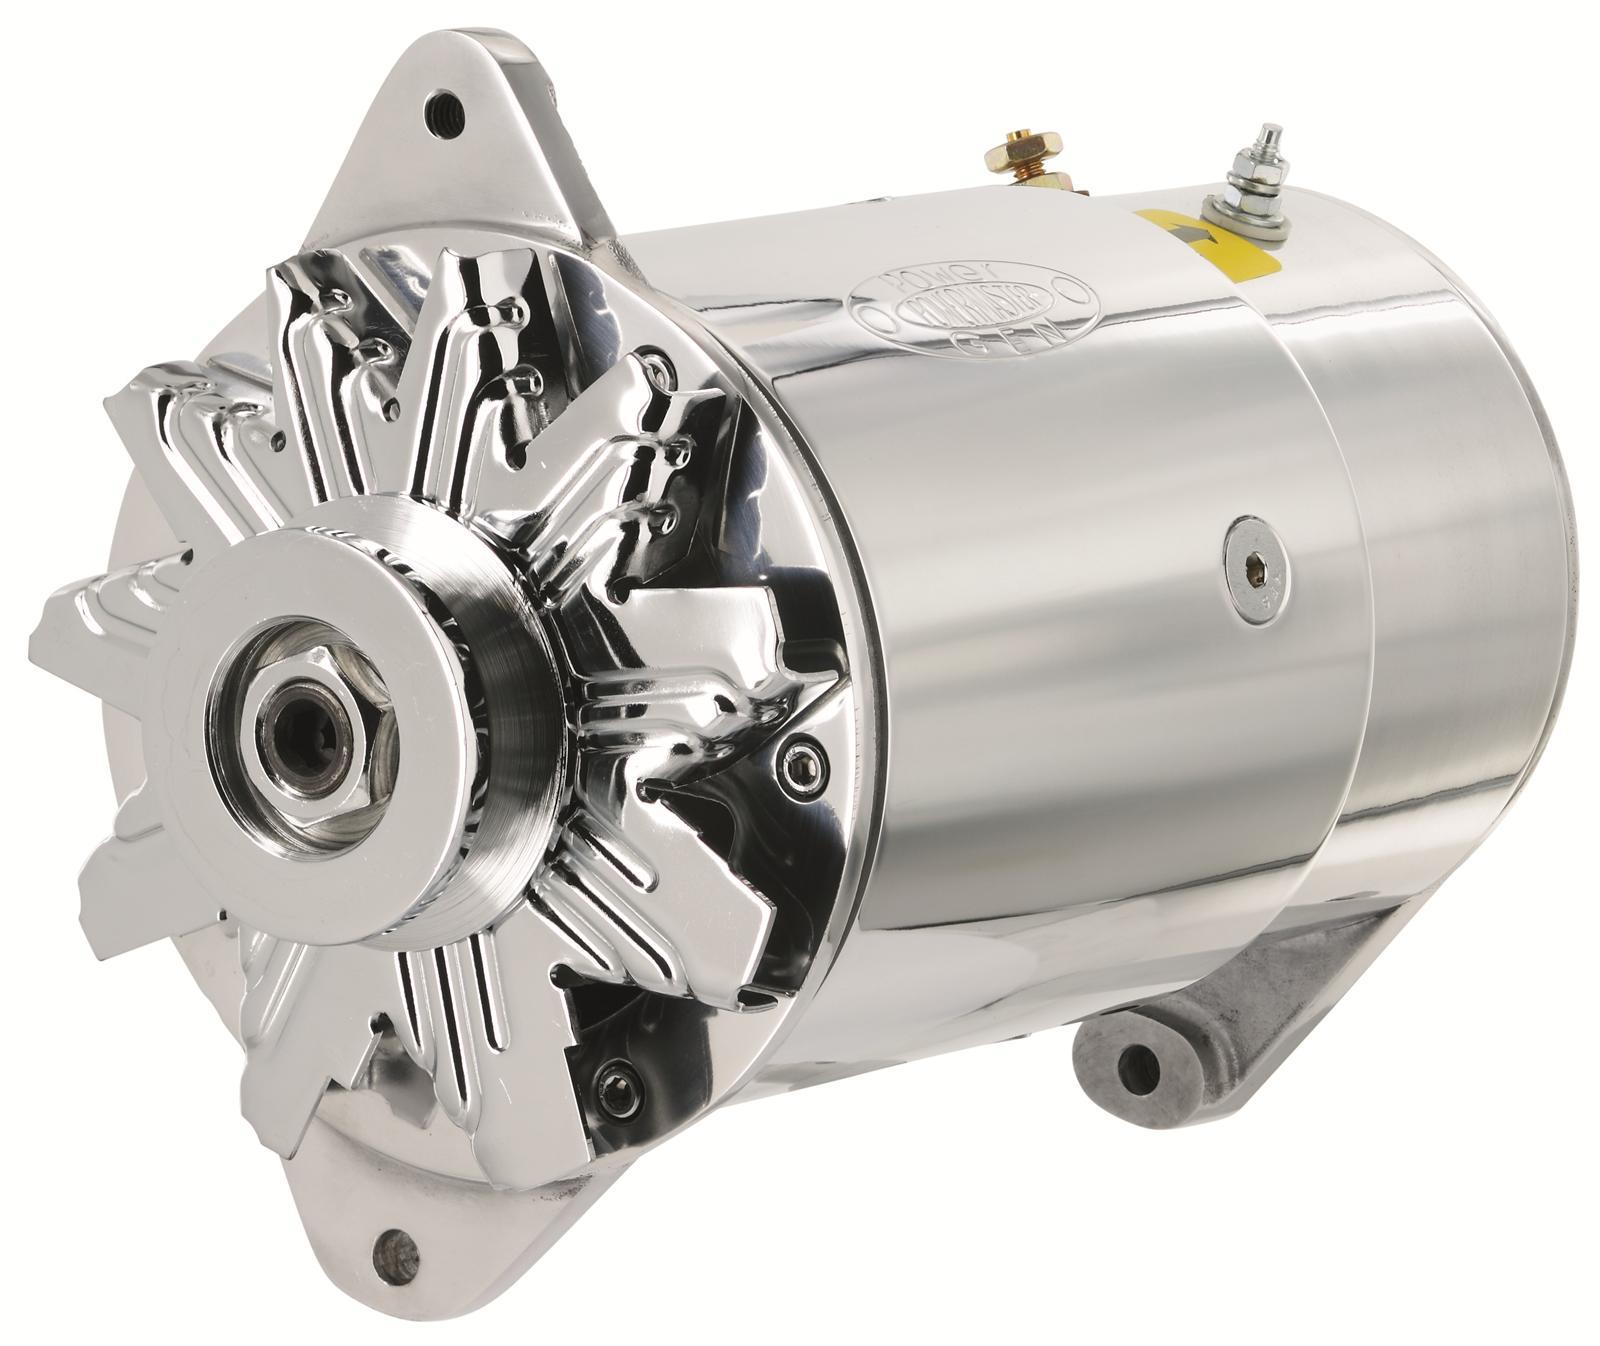 Powermaster Powergen Alternator 75 Amps Polished 12v